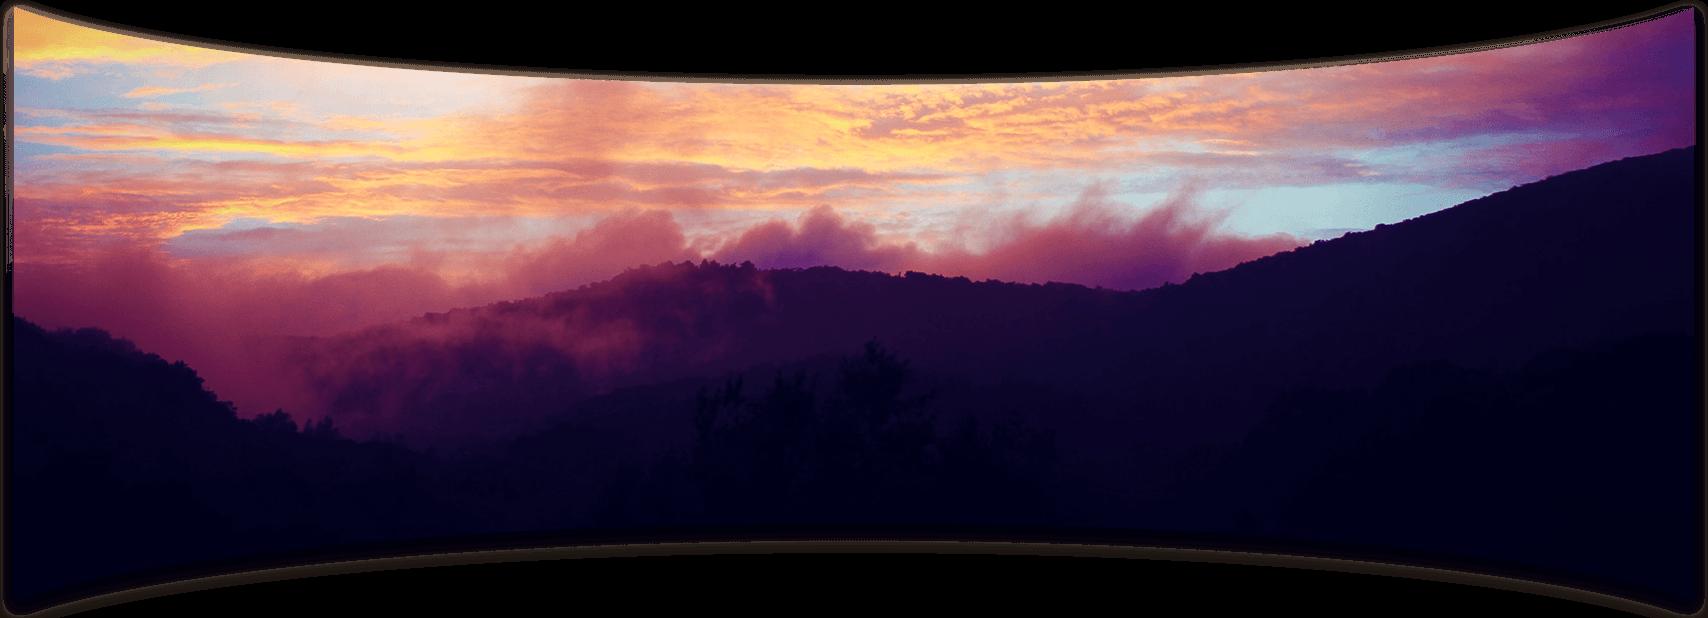 Banner Elk Winery & Villa, NC, USA